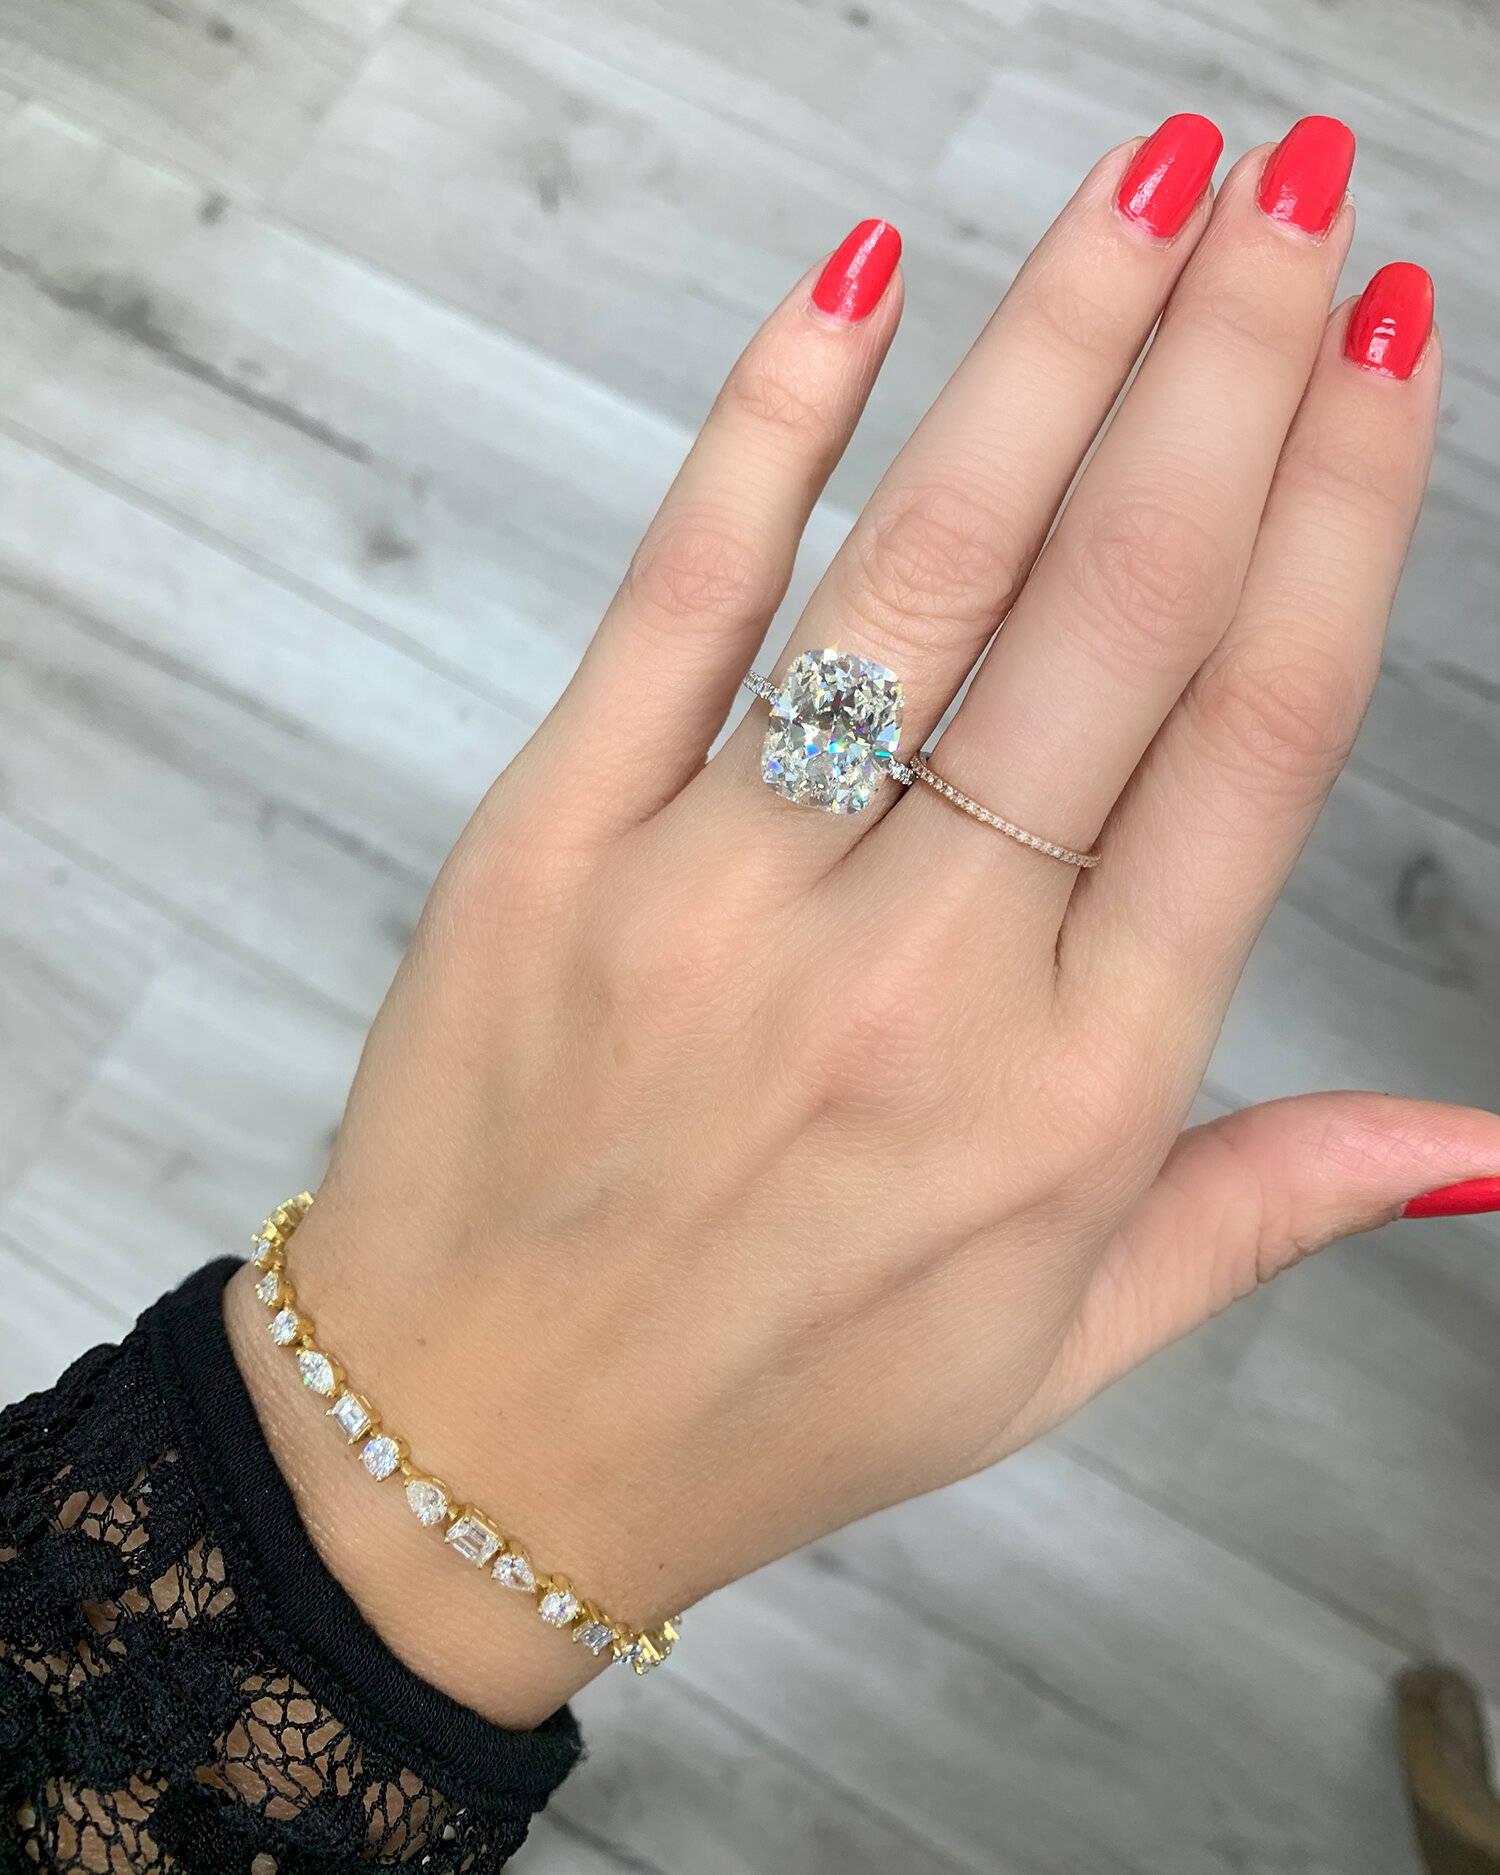 Miss Diamond Ring 7 Carat 8 Carat Radiant Diamond Engagement Ring